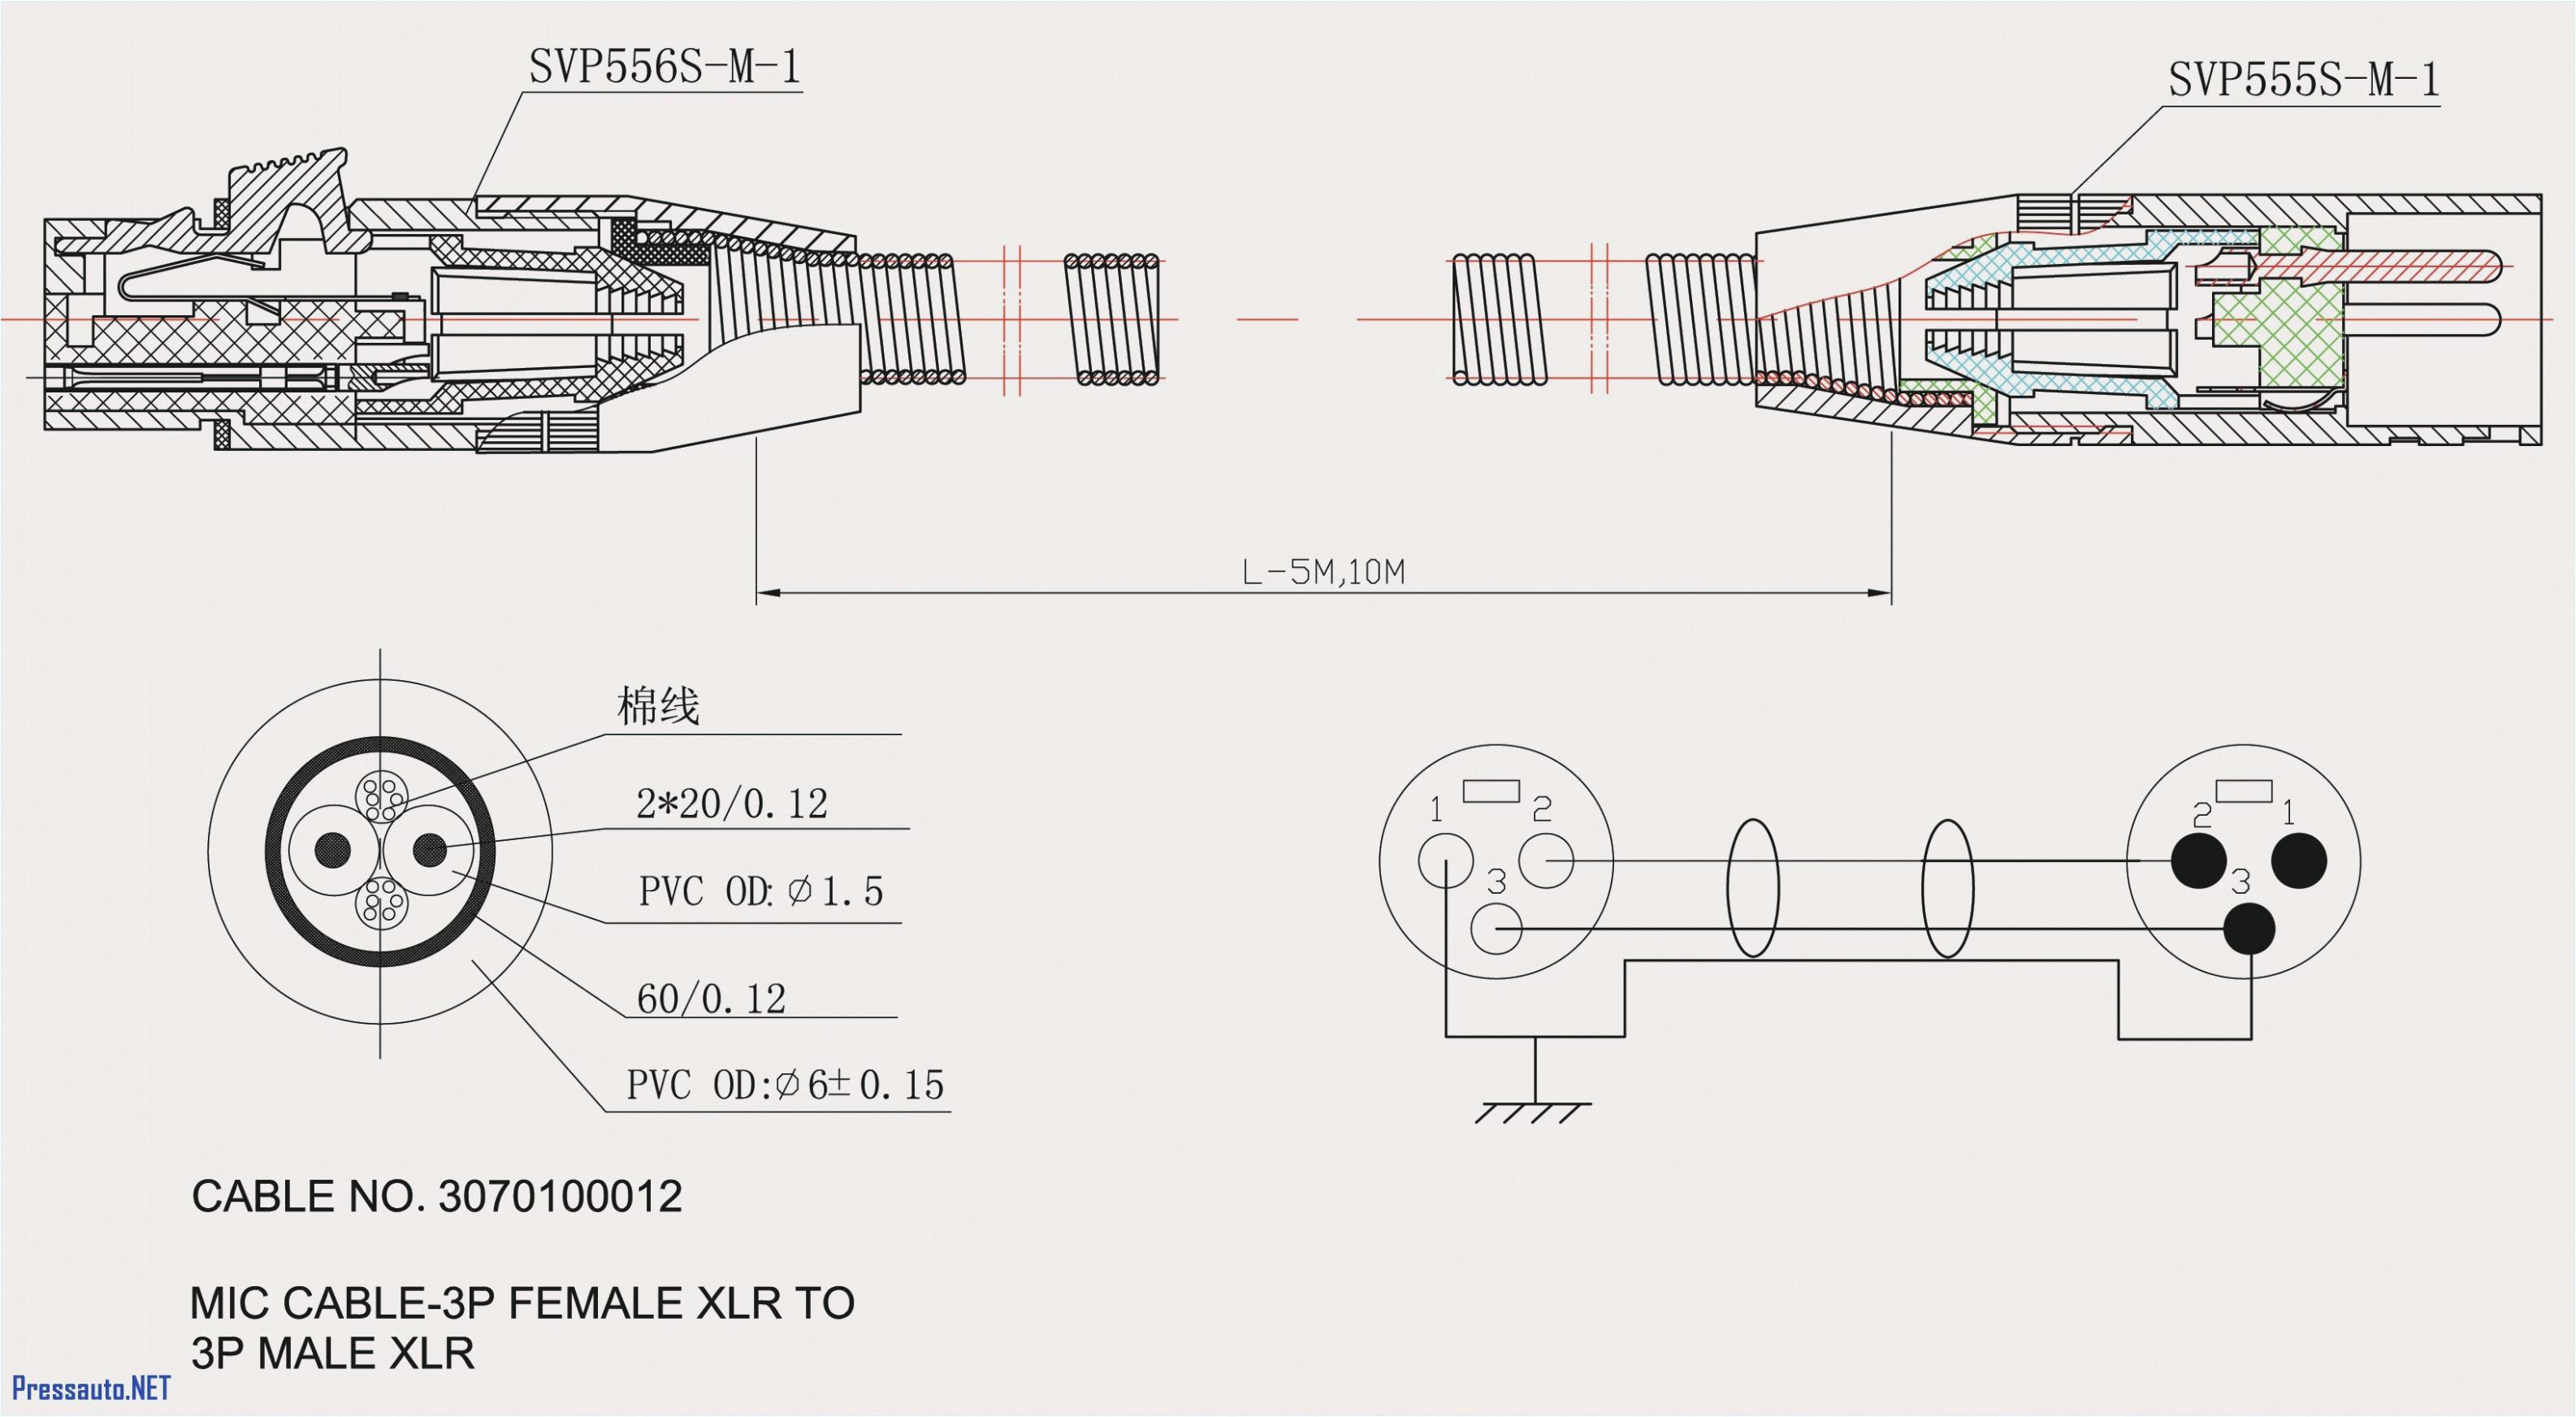 2002s 10 plug wire diagram